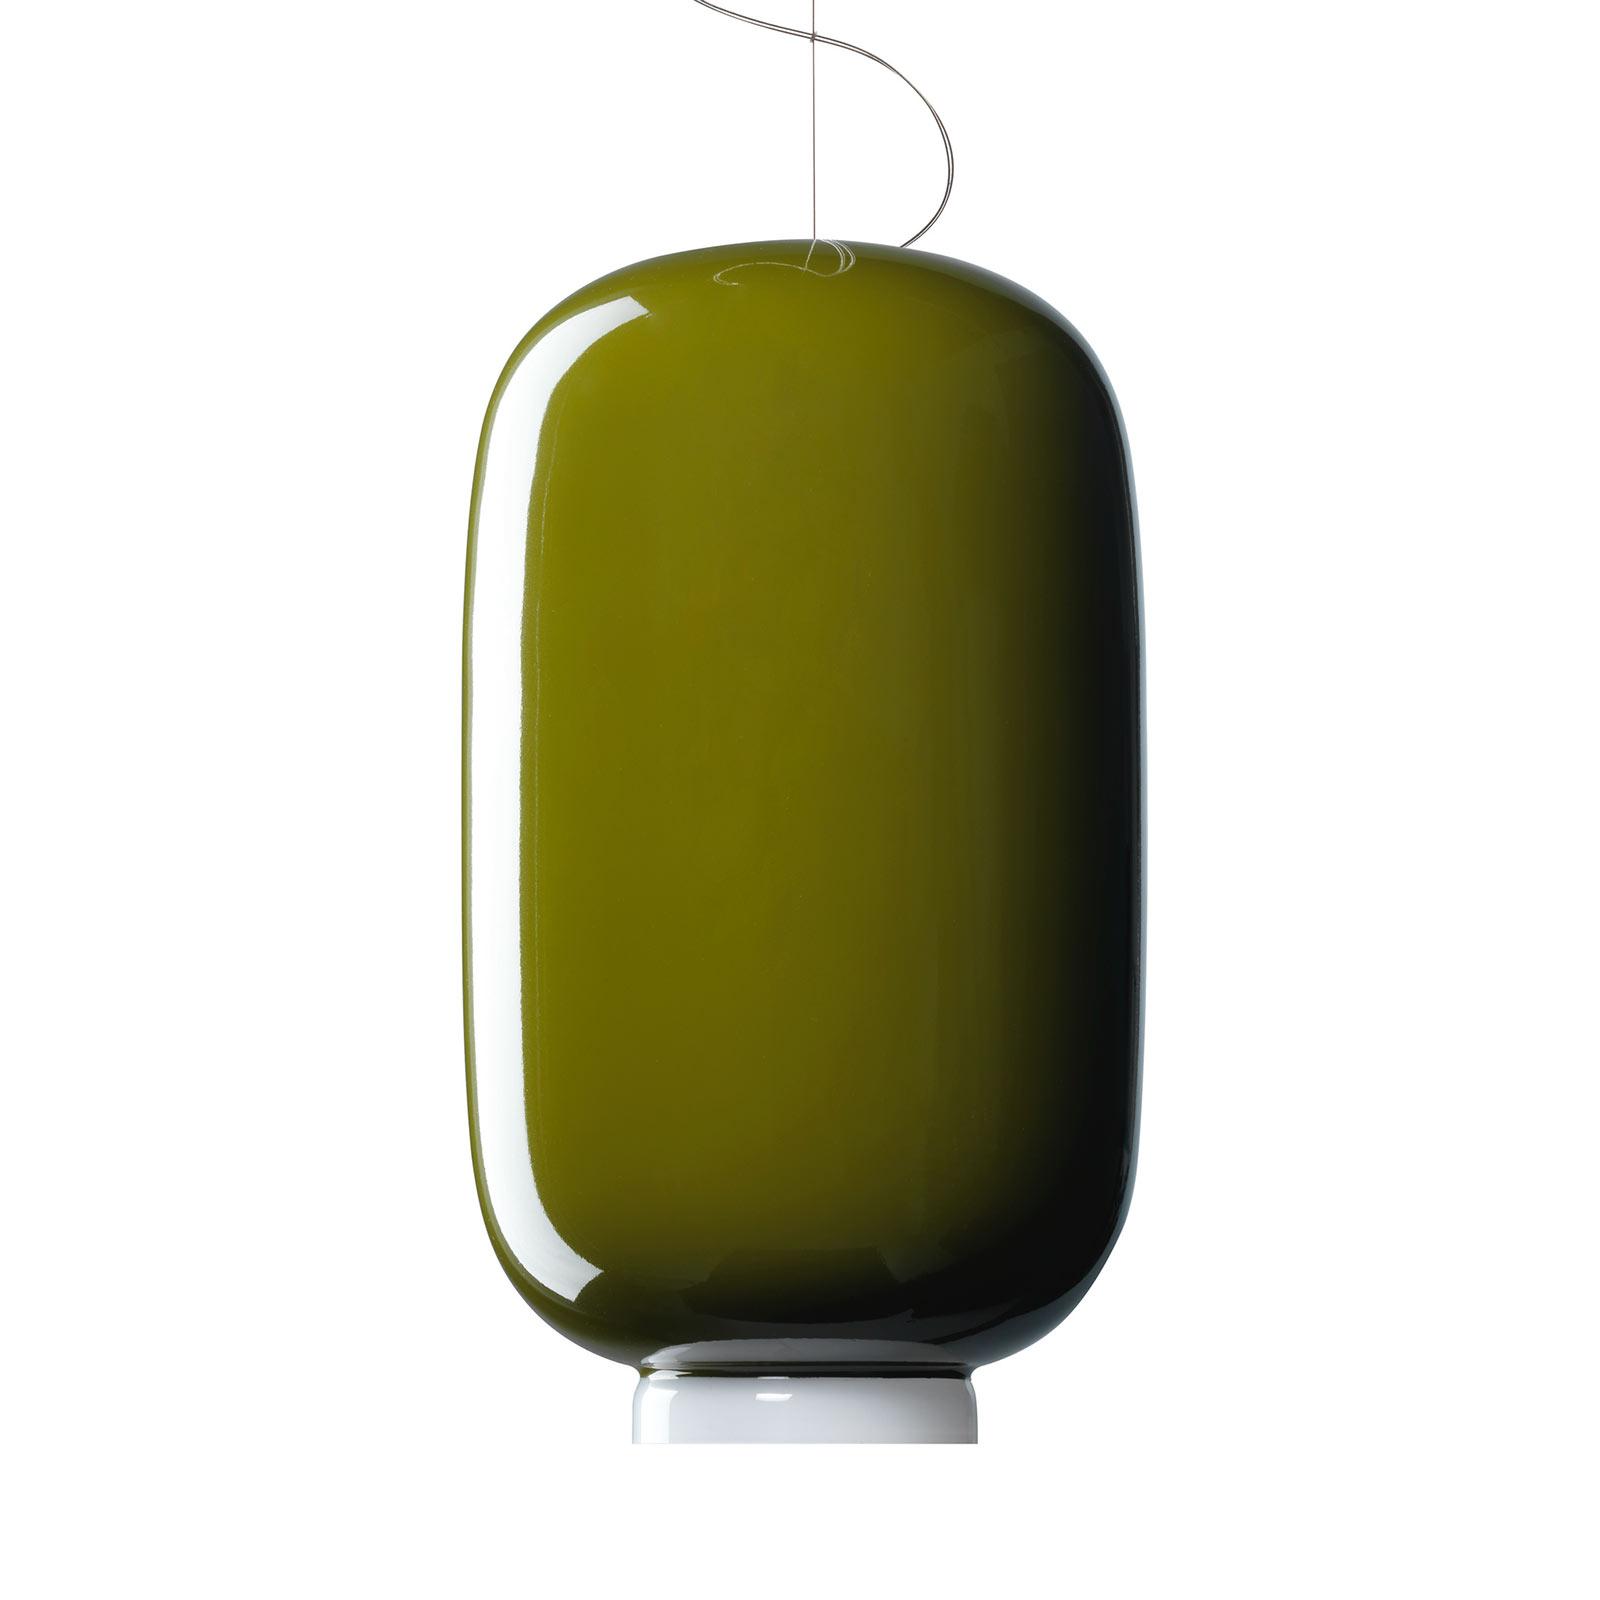 Foscarini Chouchin 2 LED-Hängeleuchte, grün